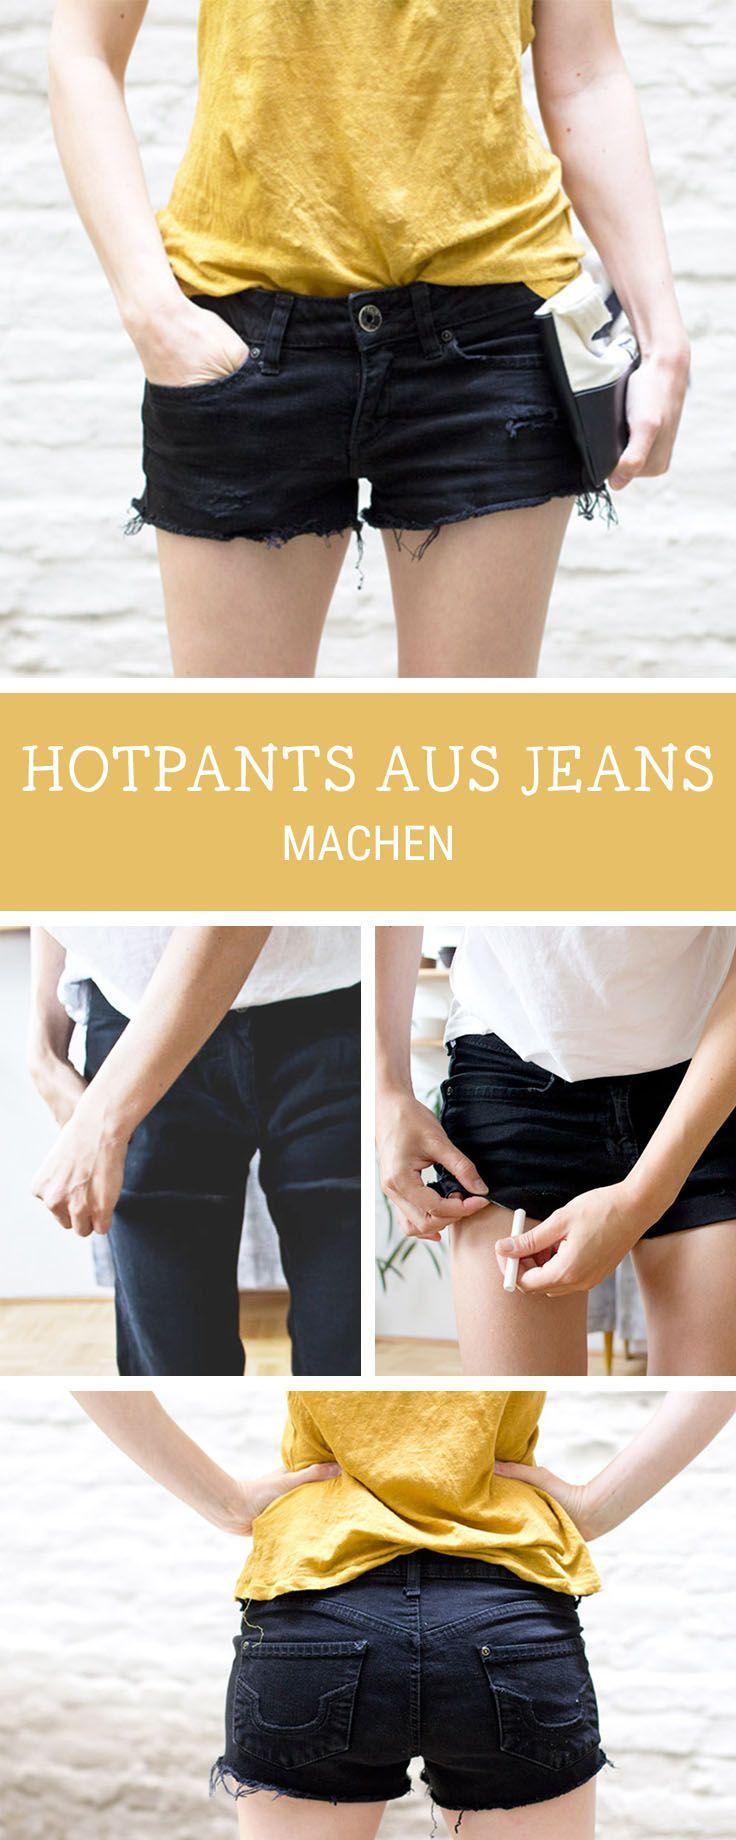 Nähanleitung für Hotpants: Wir zeigen Dir, wie Du alte Hosen in die perfekte Hotpants-Länge verwandelst / sewing inspiration: turn your old trousers into perfectly fitting hotpants, upcycling via DaWanda.com